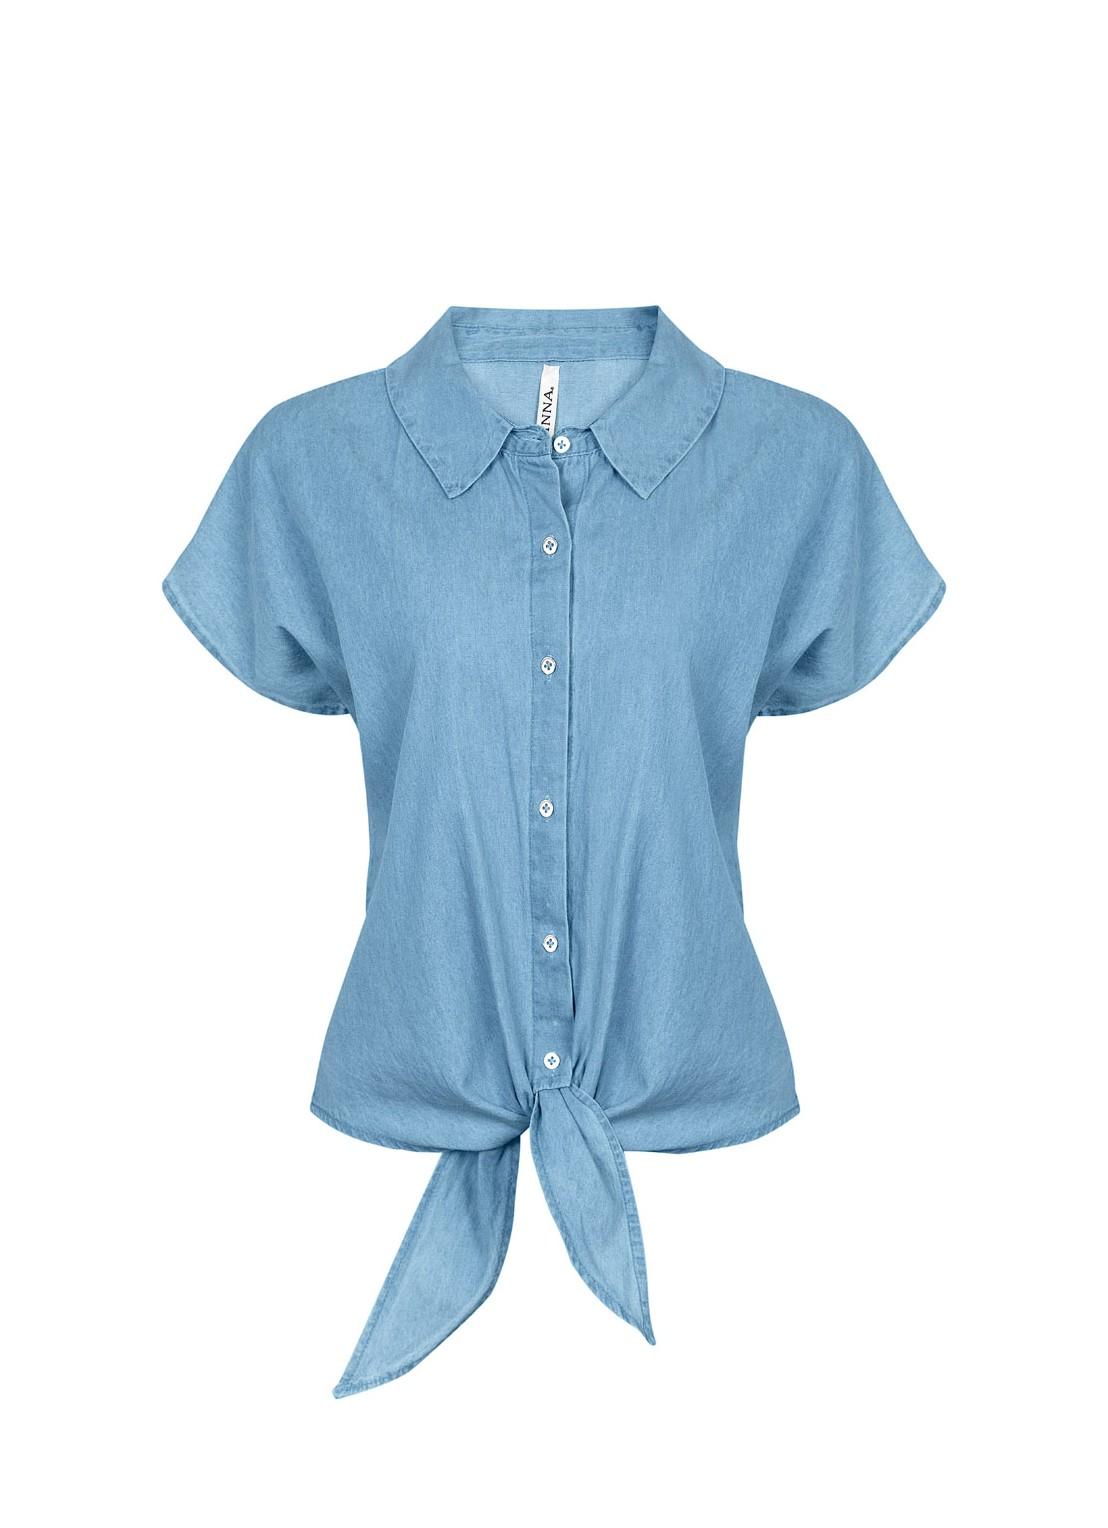 Camisa manga corta mezclilla